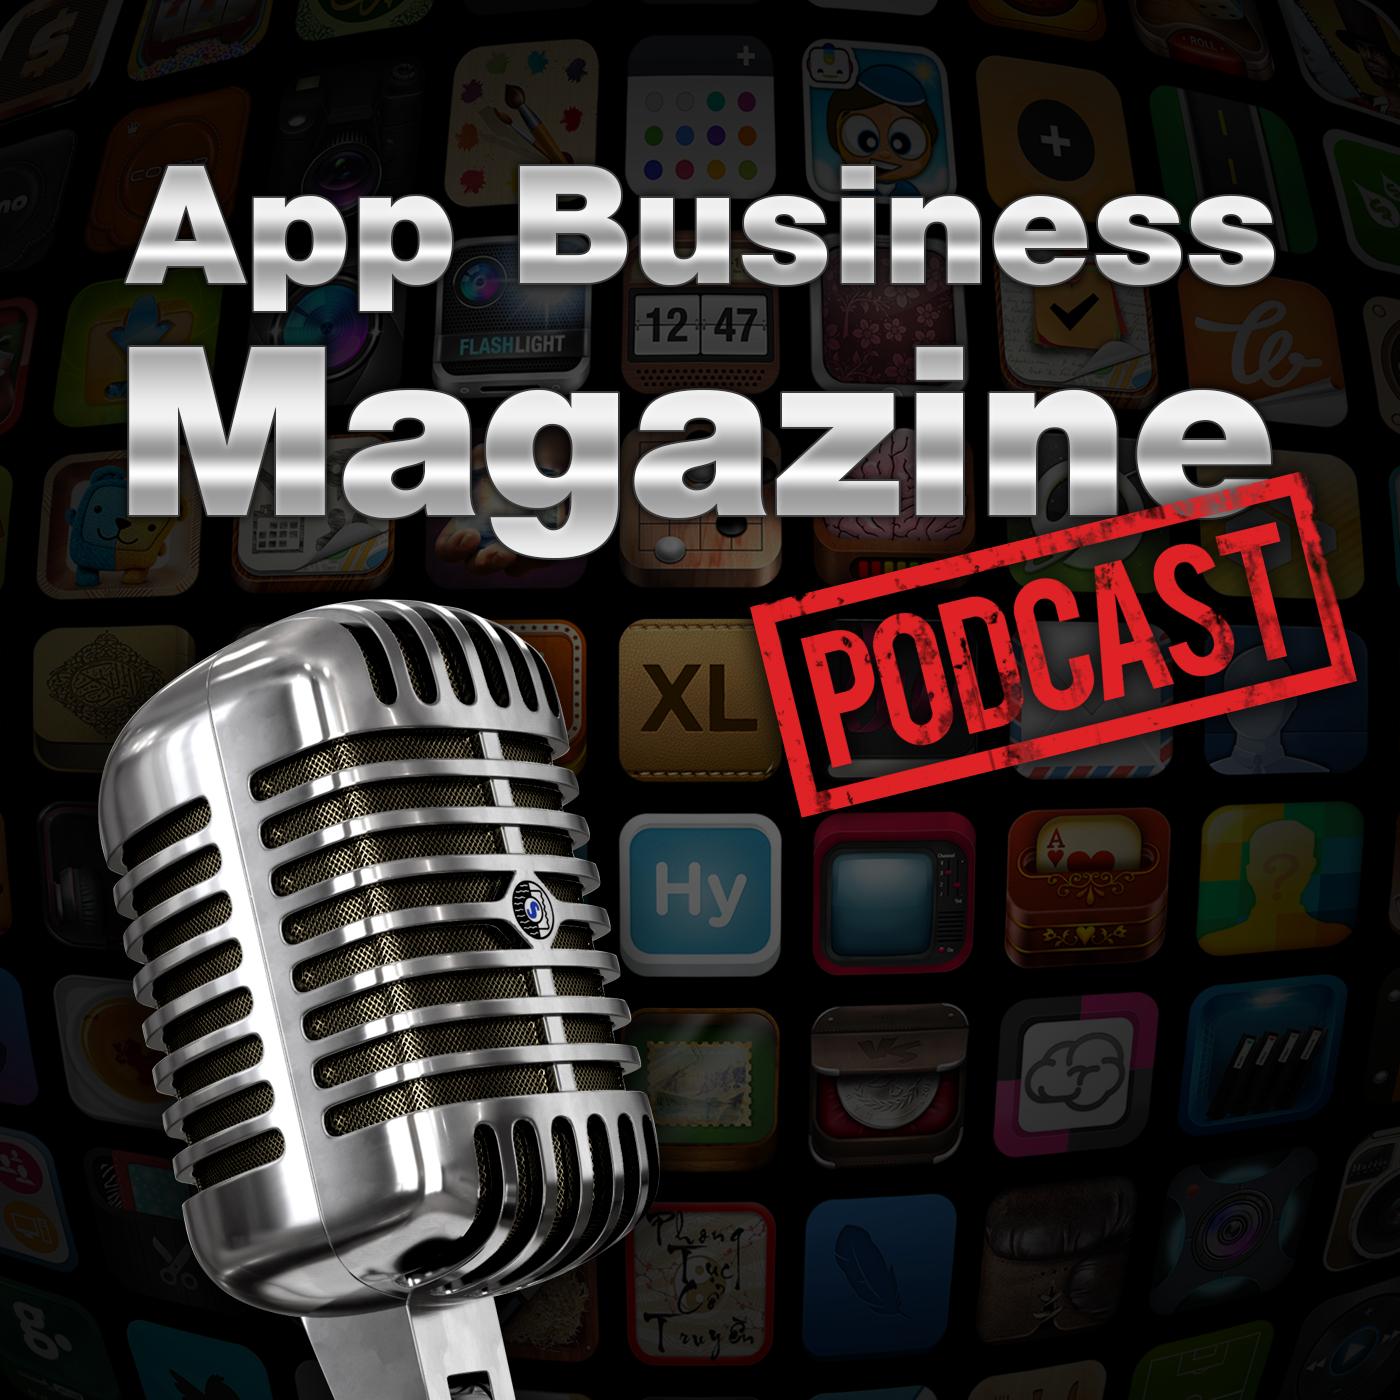 <![CDATA[App Business Magazine Podcast]]>